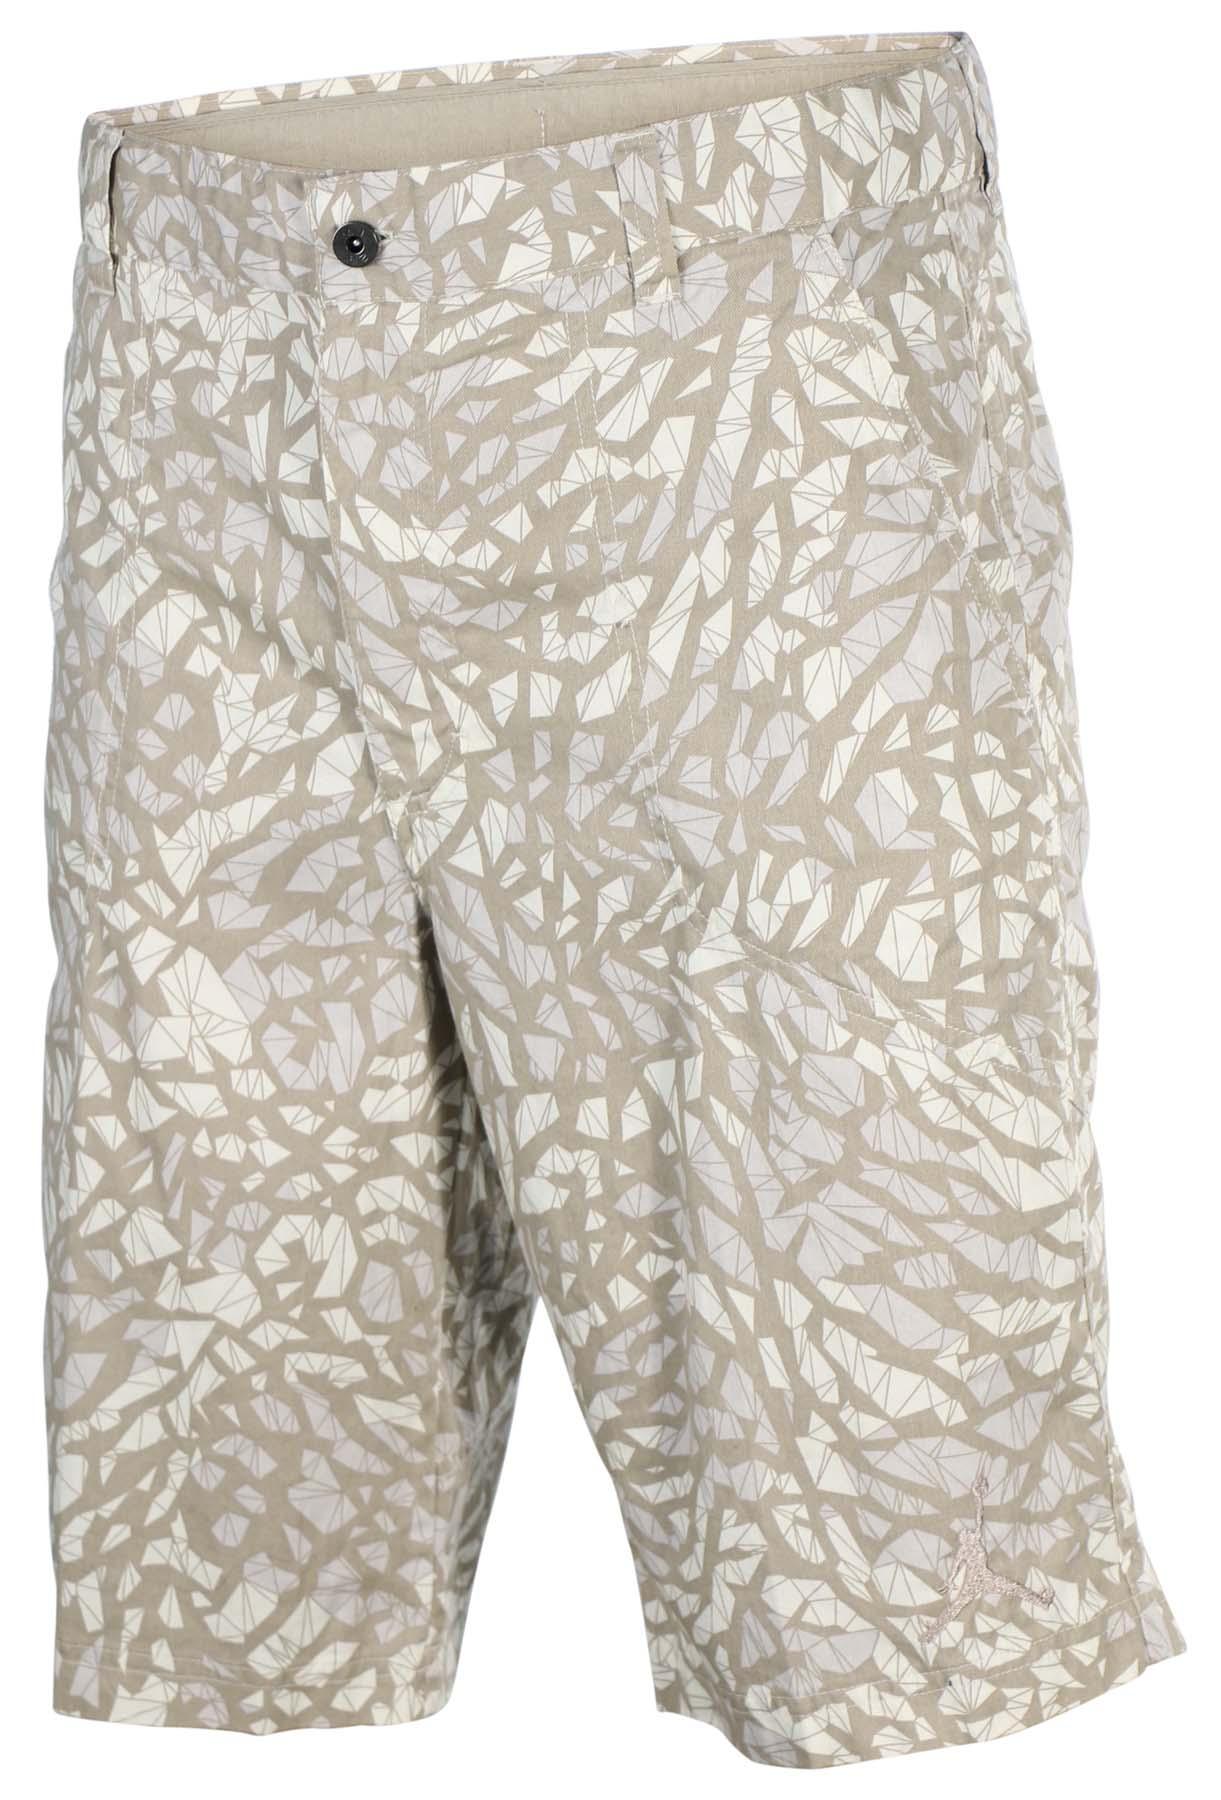 Jordan Men's Nike Fragmented Camo Jumpman Cargo Shorts | eBay